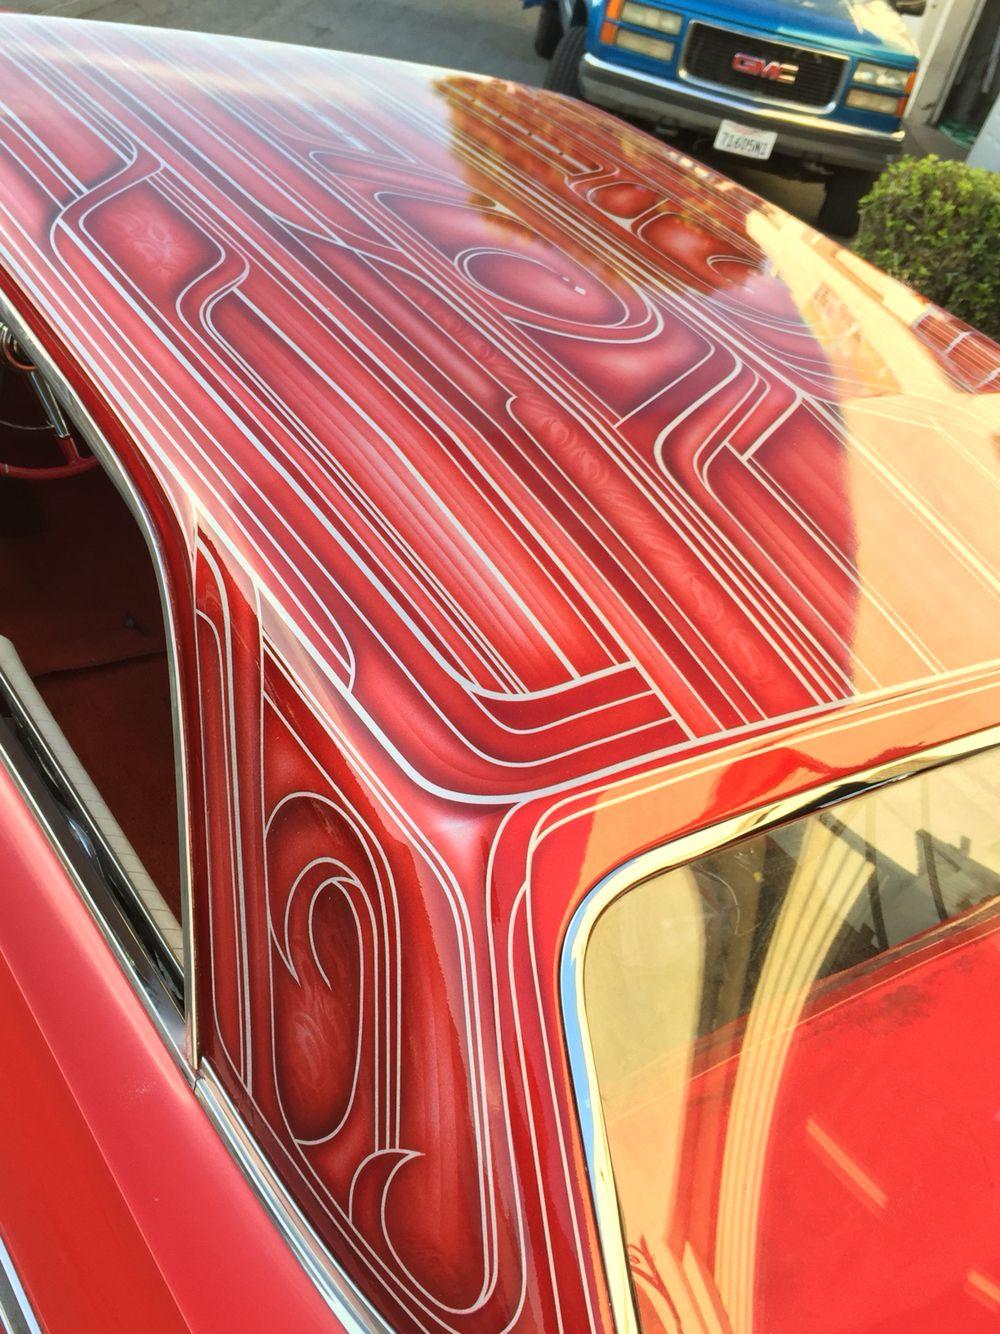 Custom paint roof on a 64 impala wit house of kolors paint | FREDDY ...